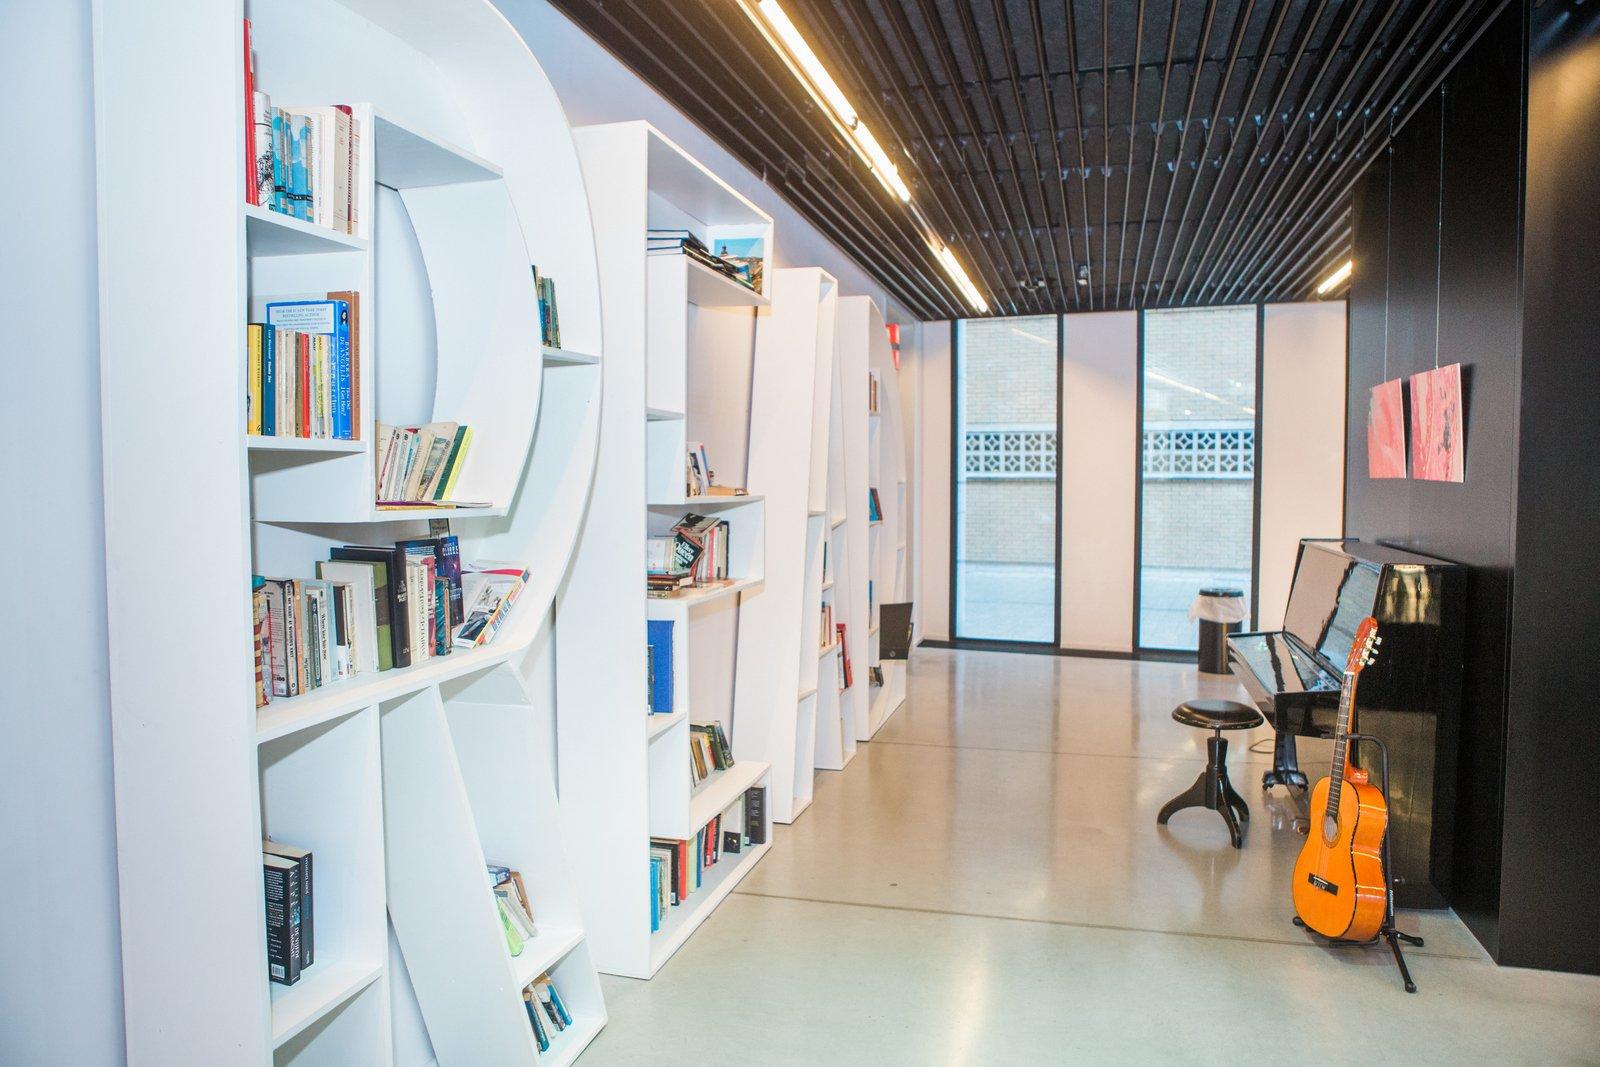 De lounge en bibliotheek van hostel Pulcinella